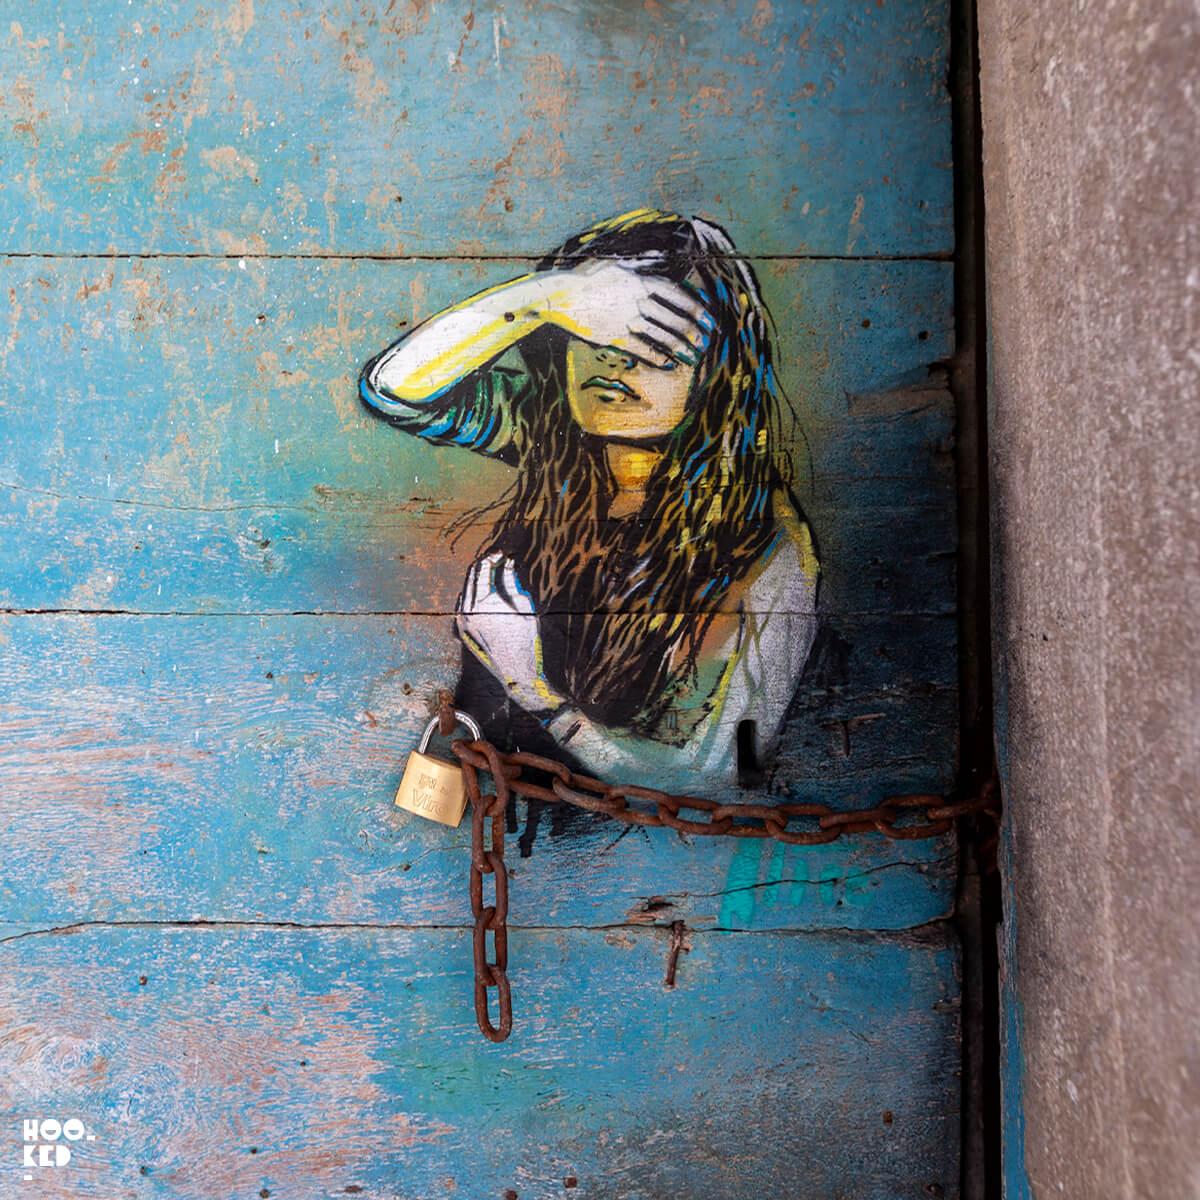 Beautiful Italian Street Art By Alice Pasquini In Civitacampomarano, Italy